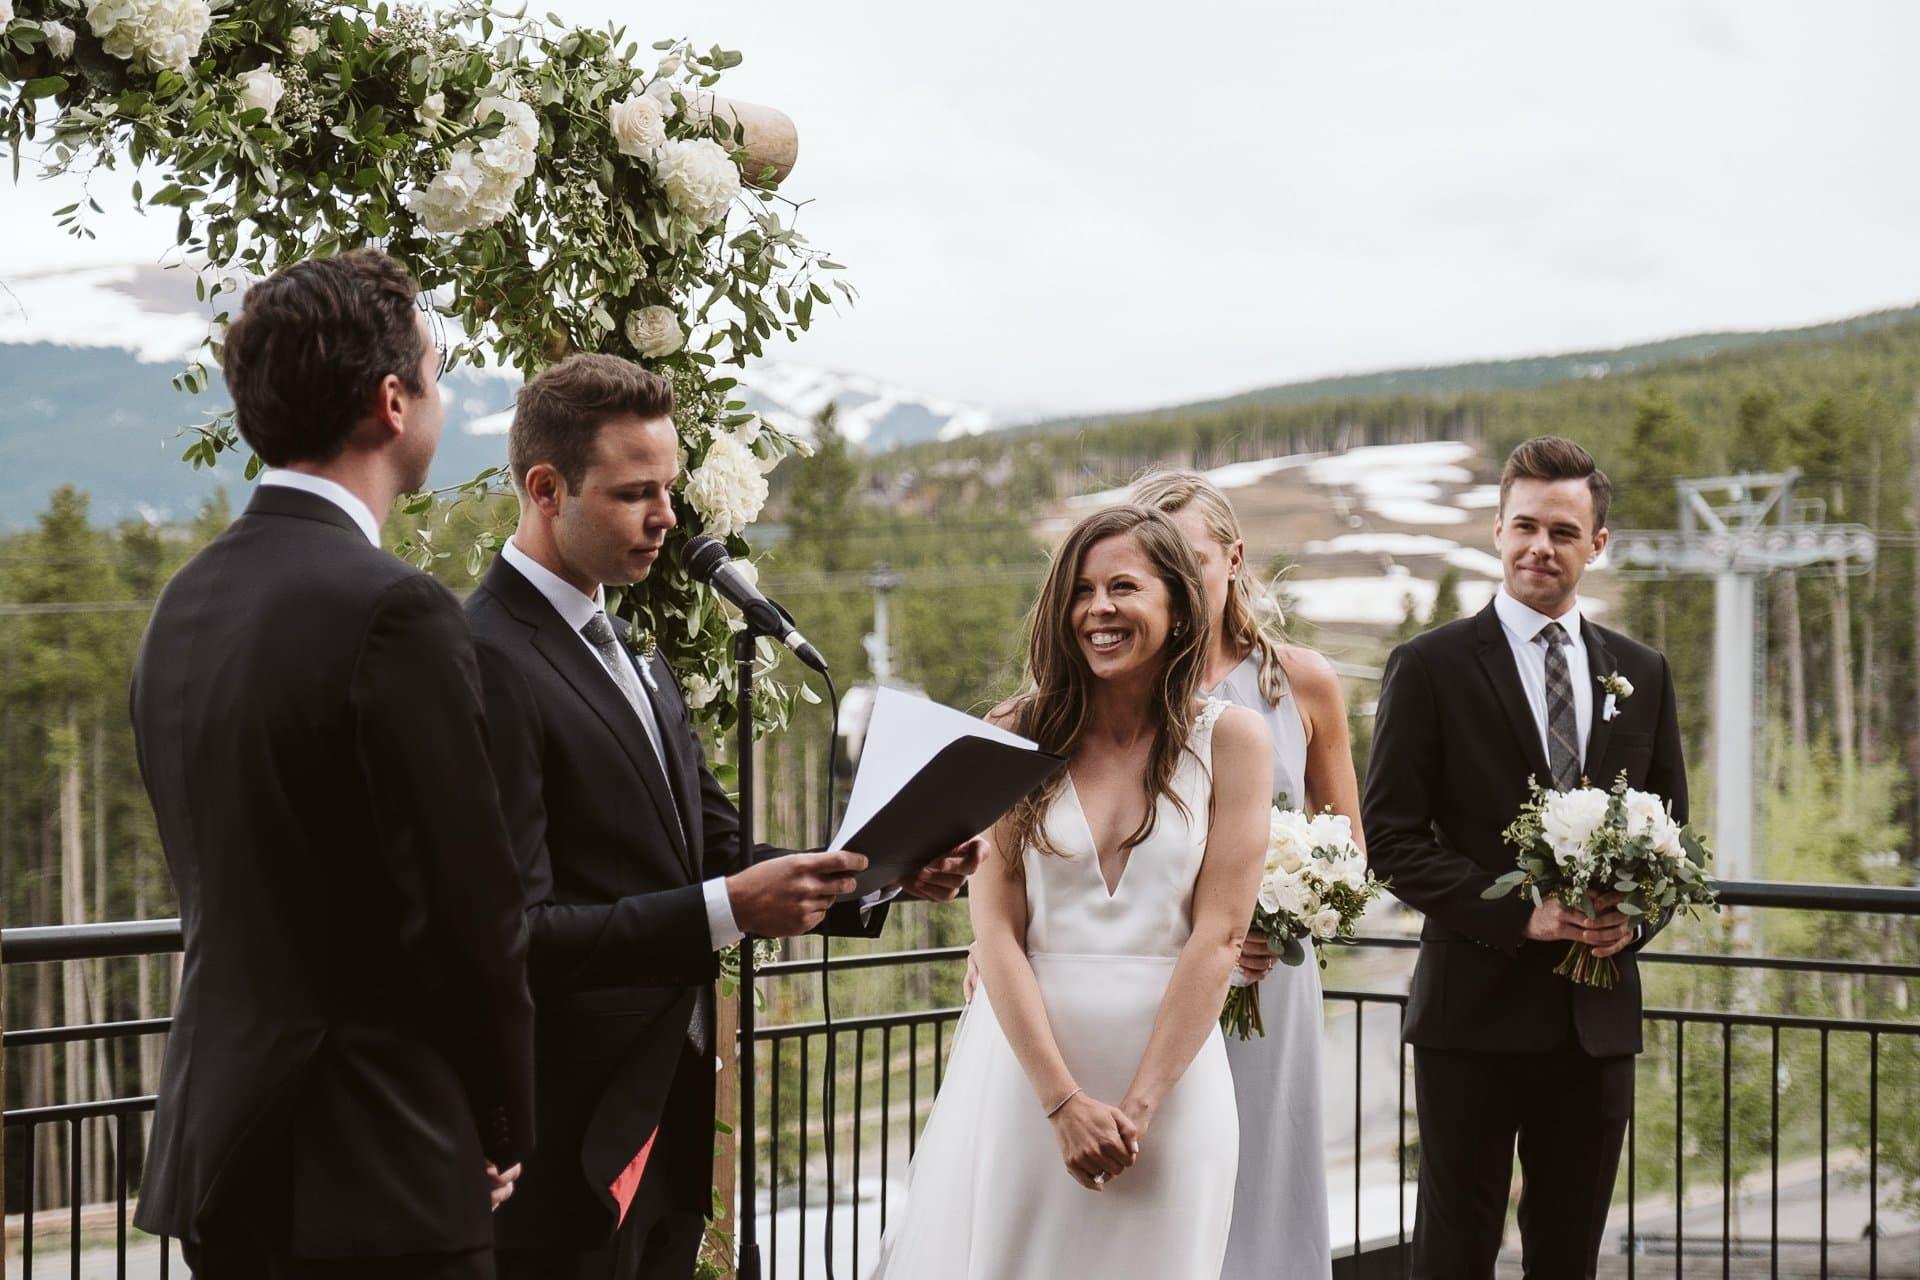 Wedding ceremony at Sevens at Breckenridge Ski Resort, Colorado mountain wedding photographer